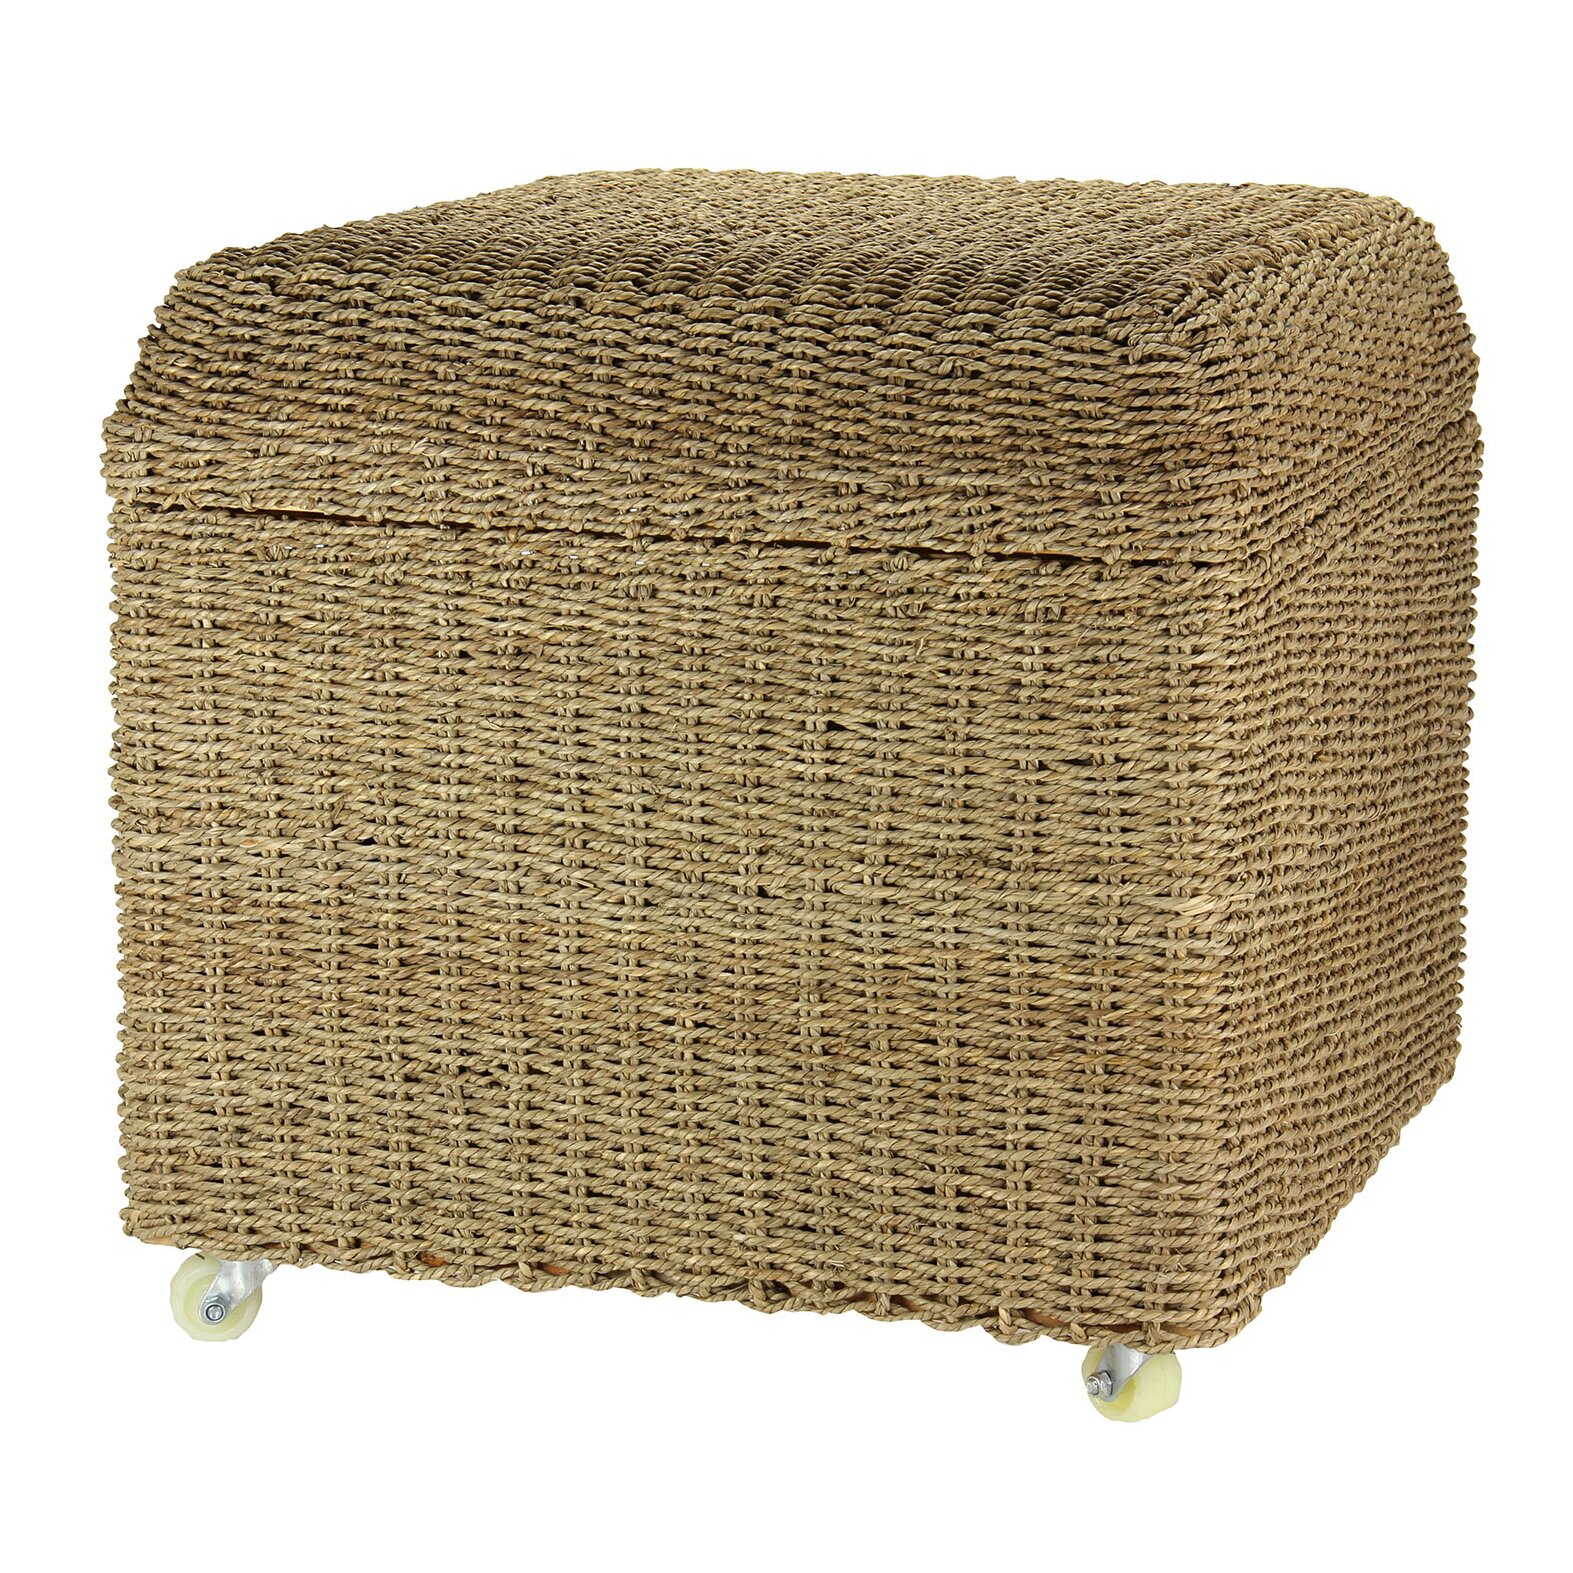 Rolling Seagrass Wicker Storage Seat Ottoman - Household Essentials Rolling Seagrass Wicker Storage Seat Ottoman